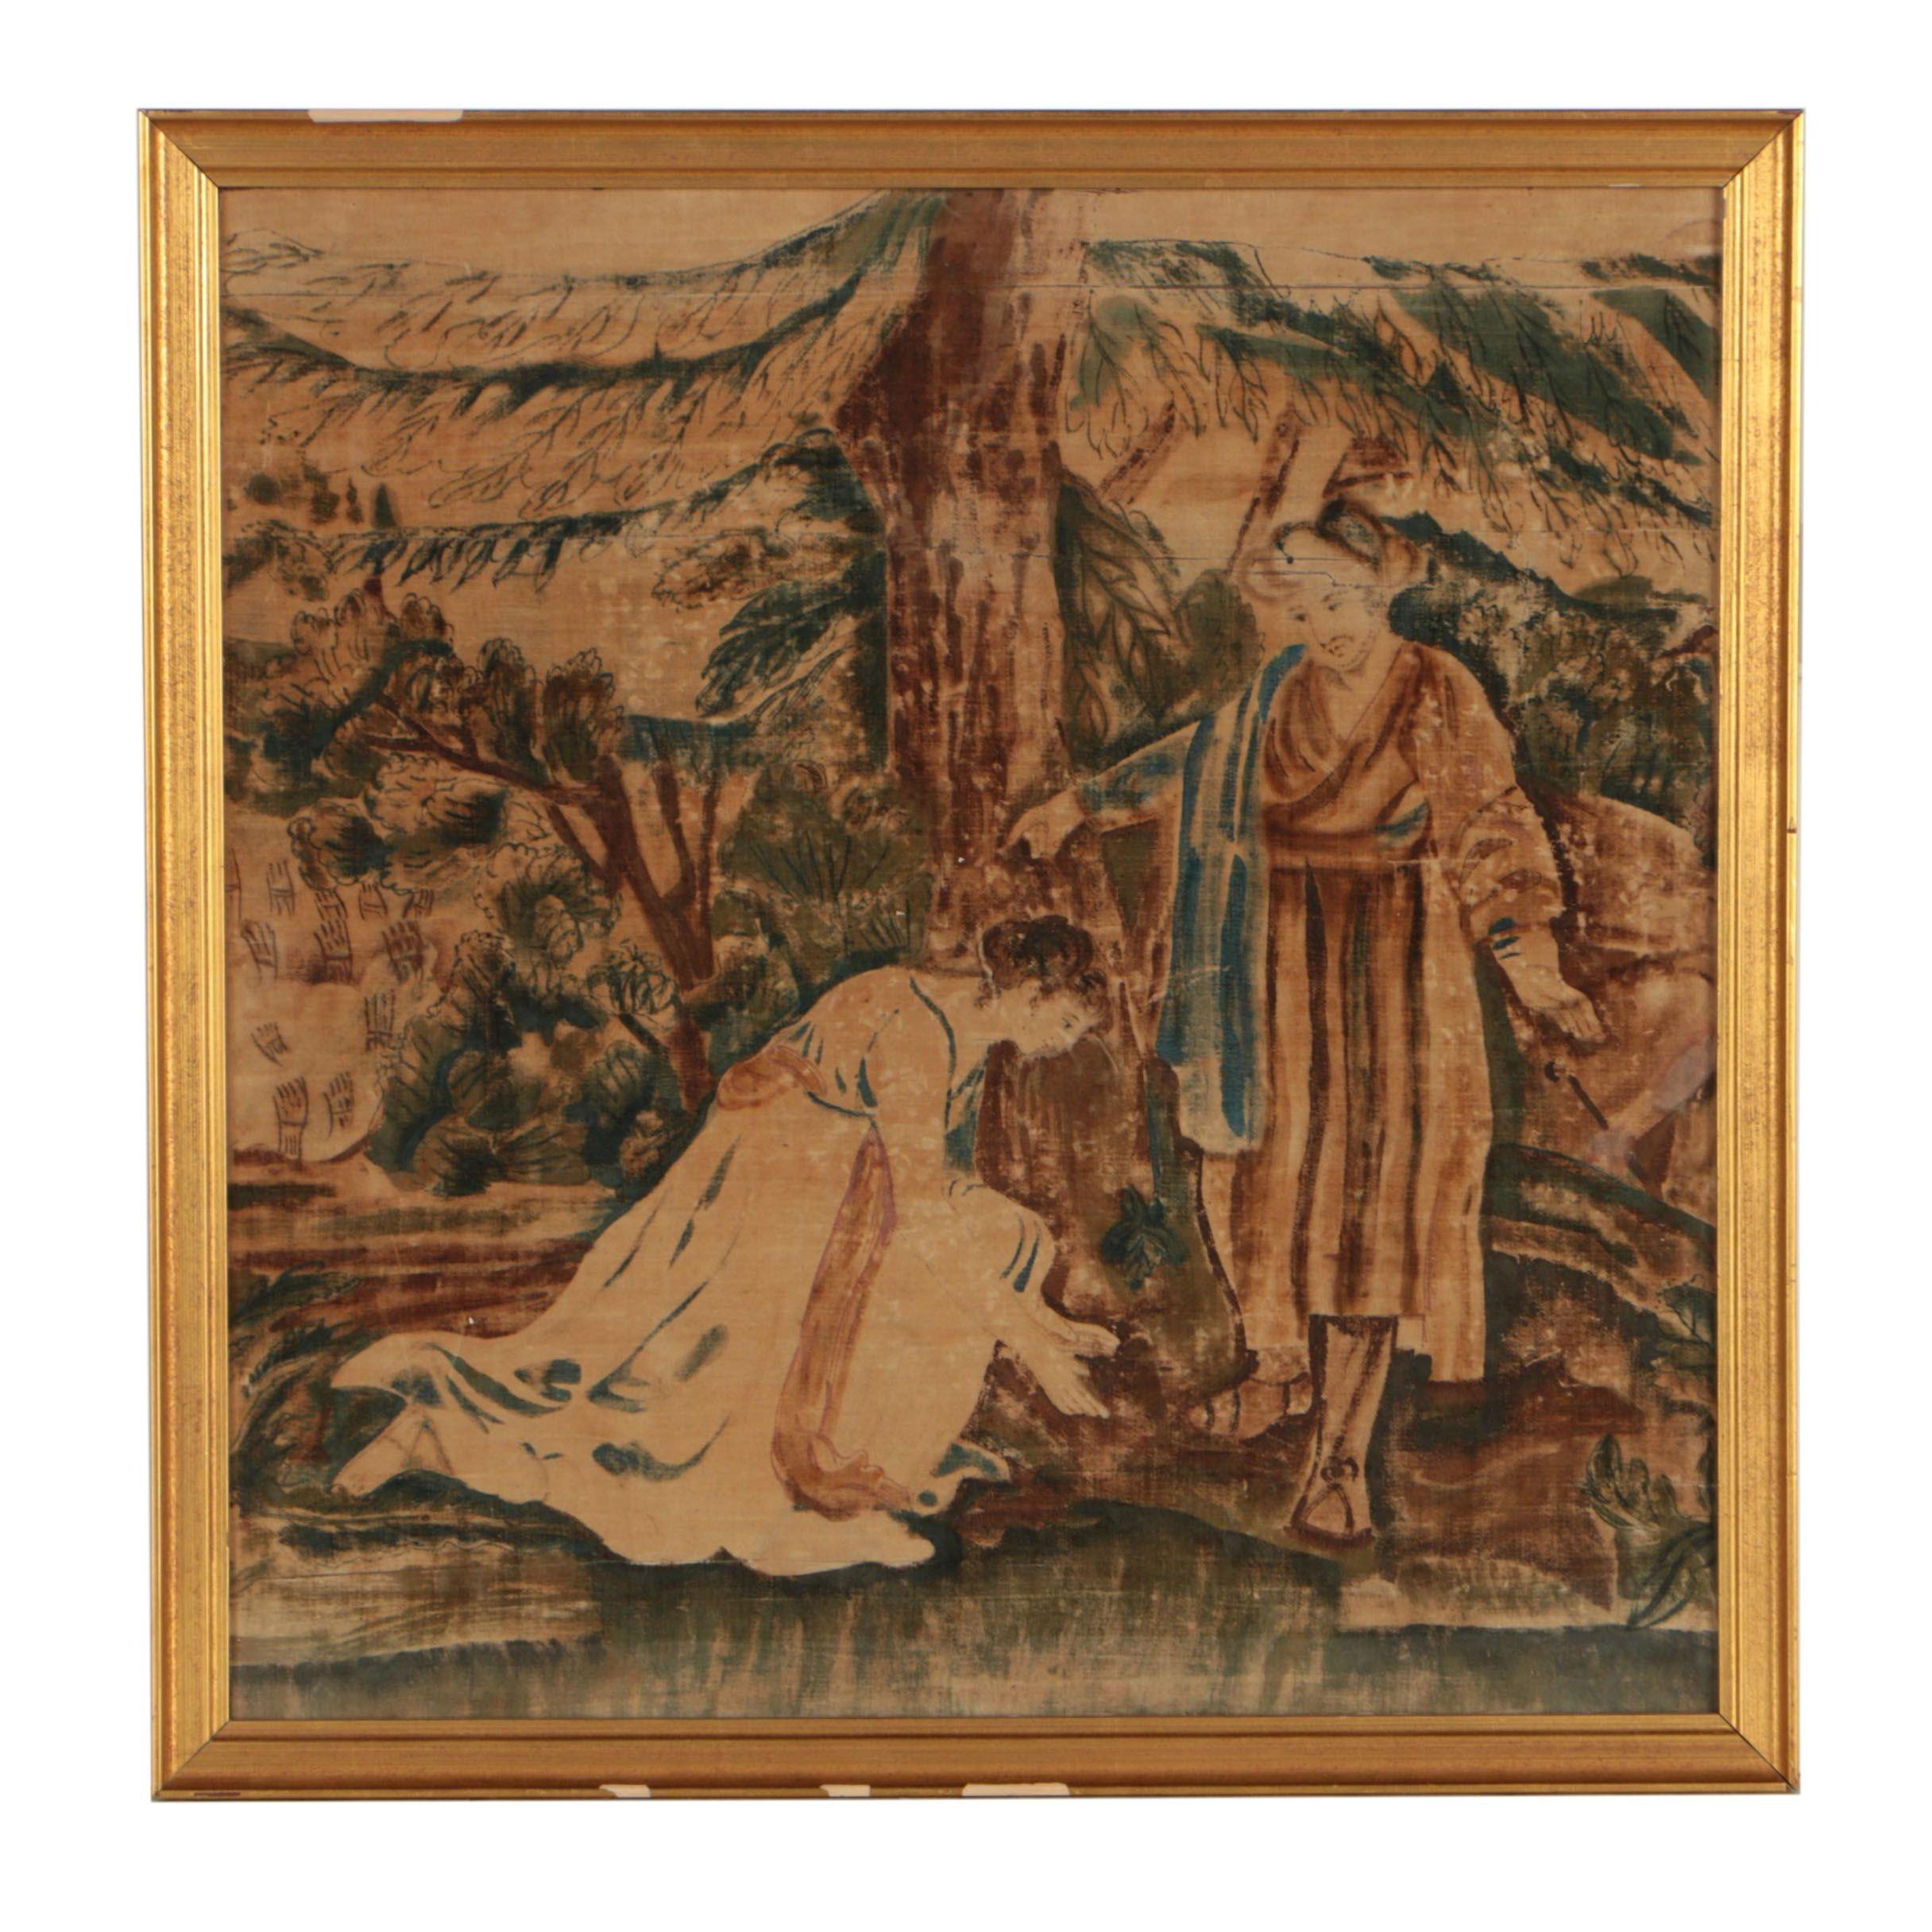 19th Century Gouache Painting on Velvet of Ruth and Boaz